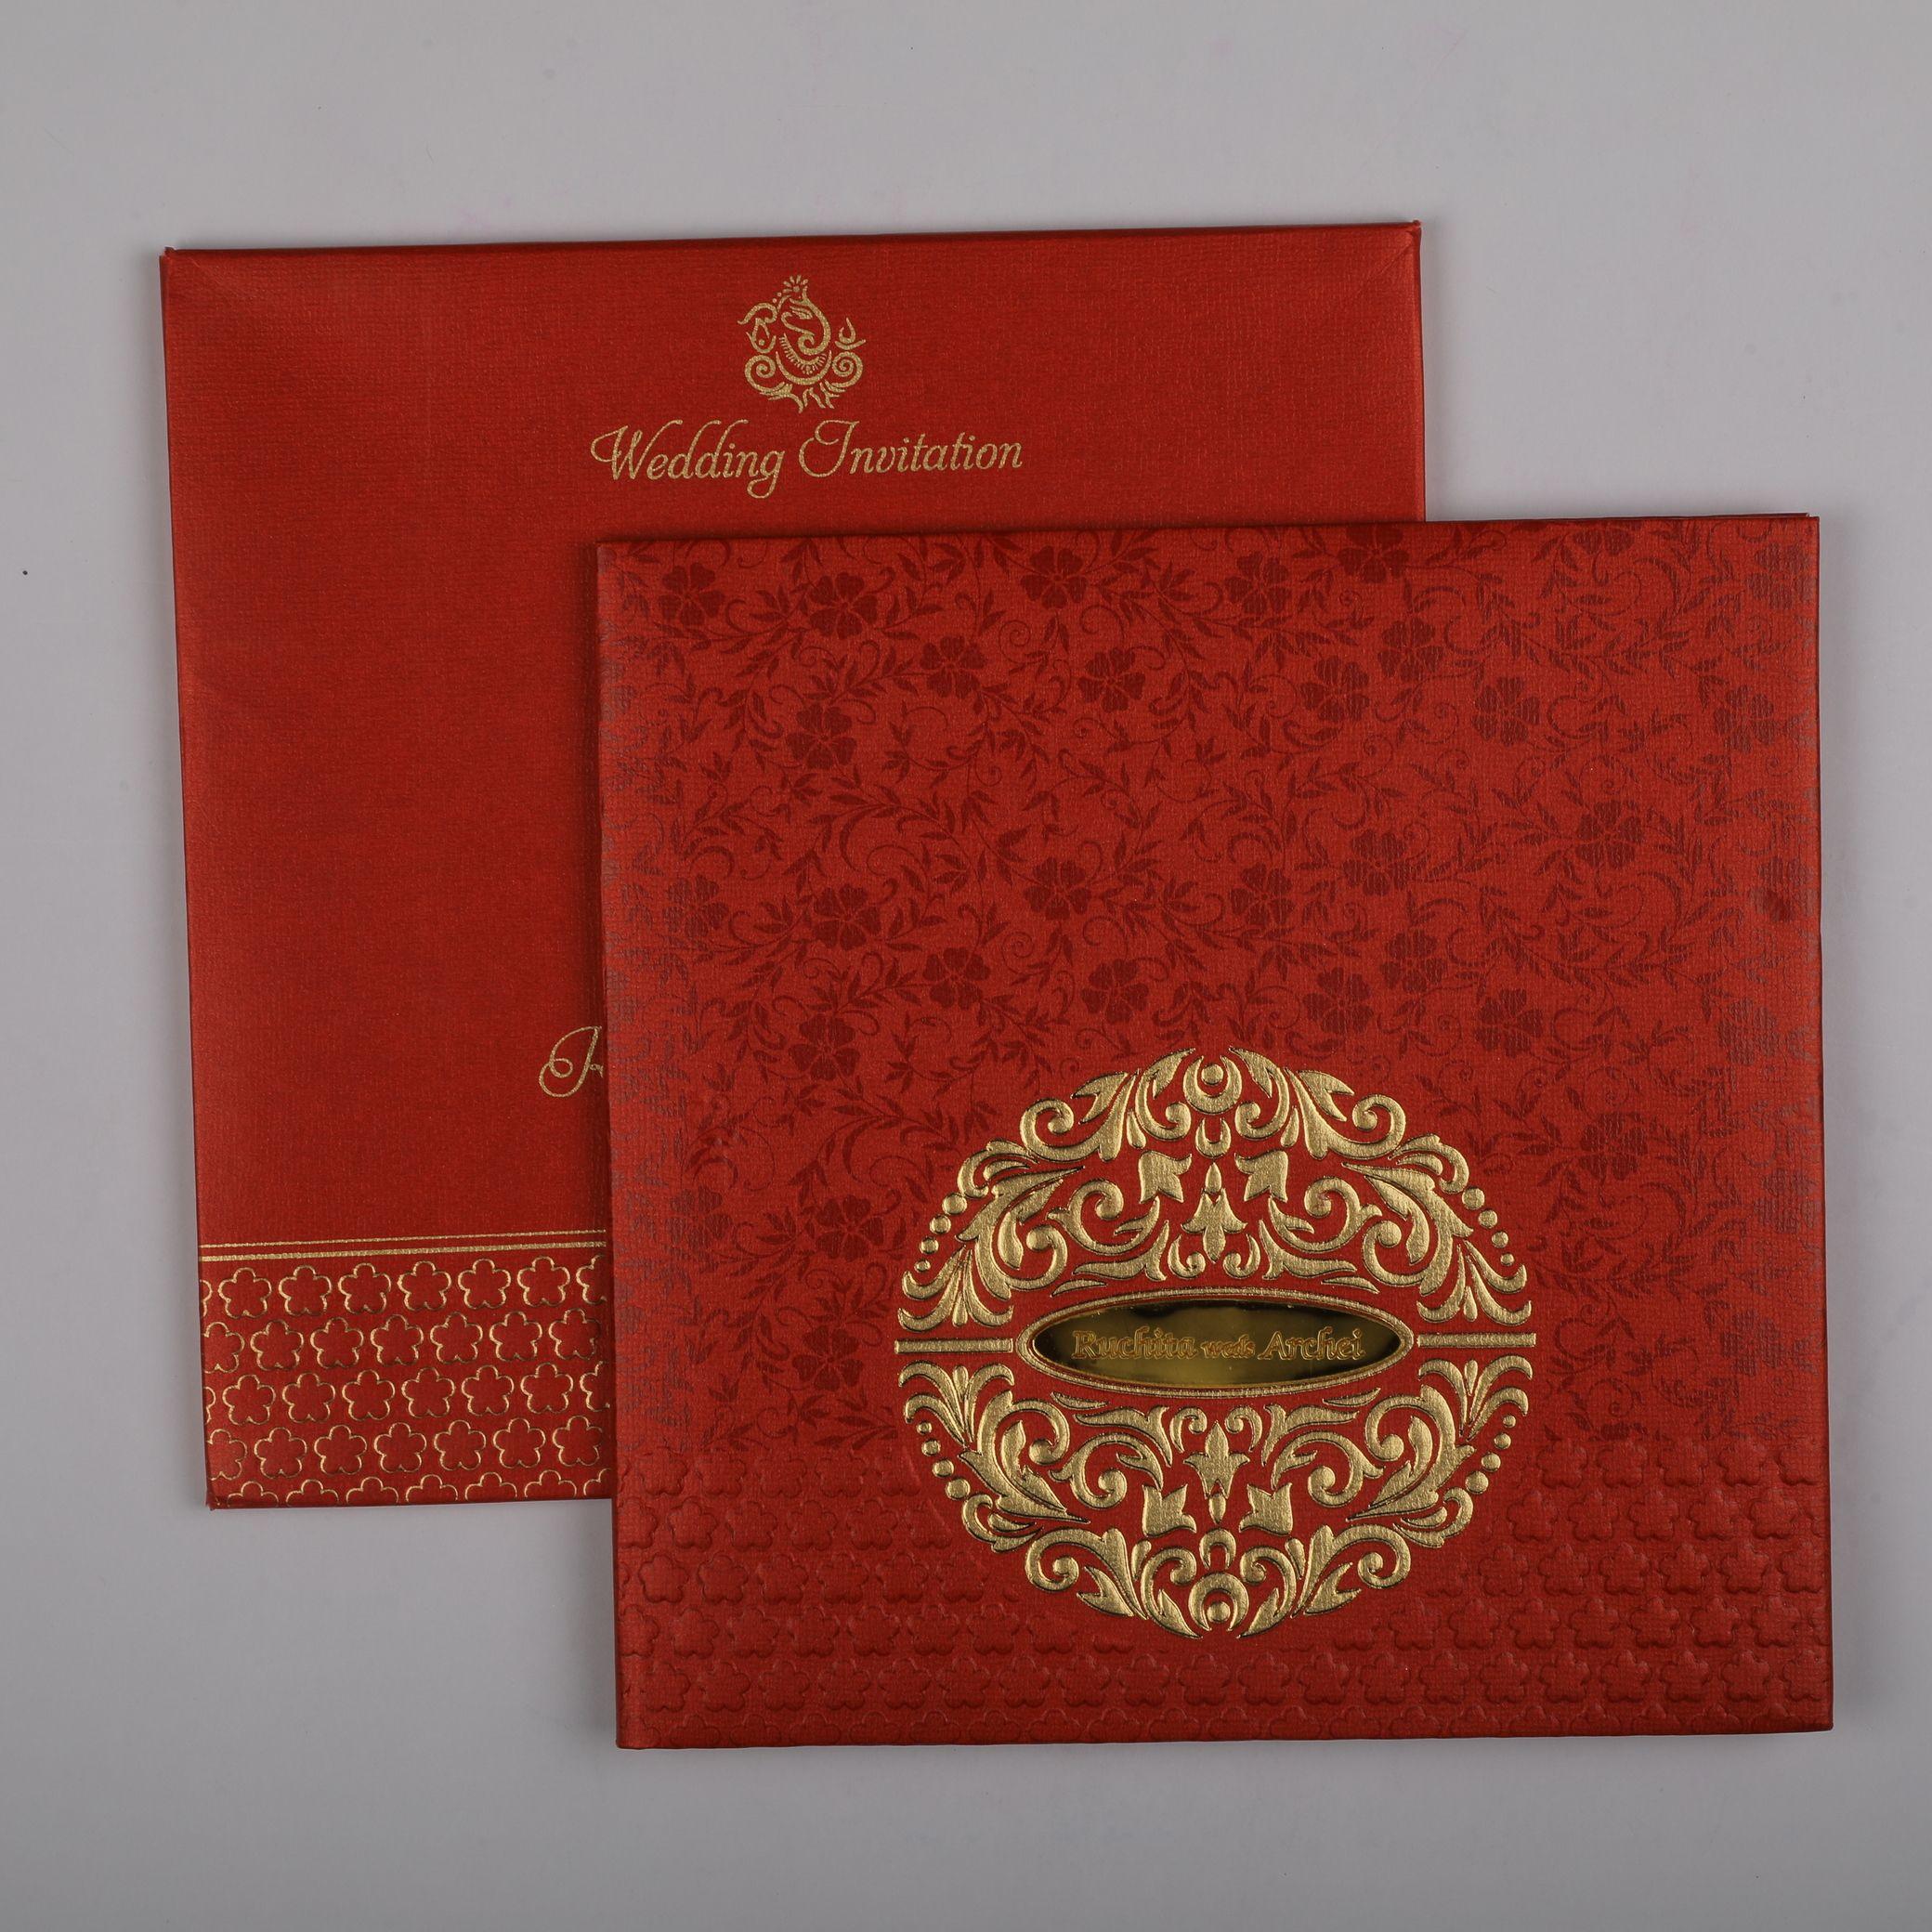 Wedding Cards Wedding Invitations Indian Wedding Cards Hindu Wedding Cards Wedding Cards Indian Wedding Invitation Cards